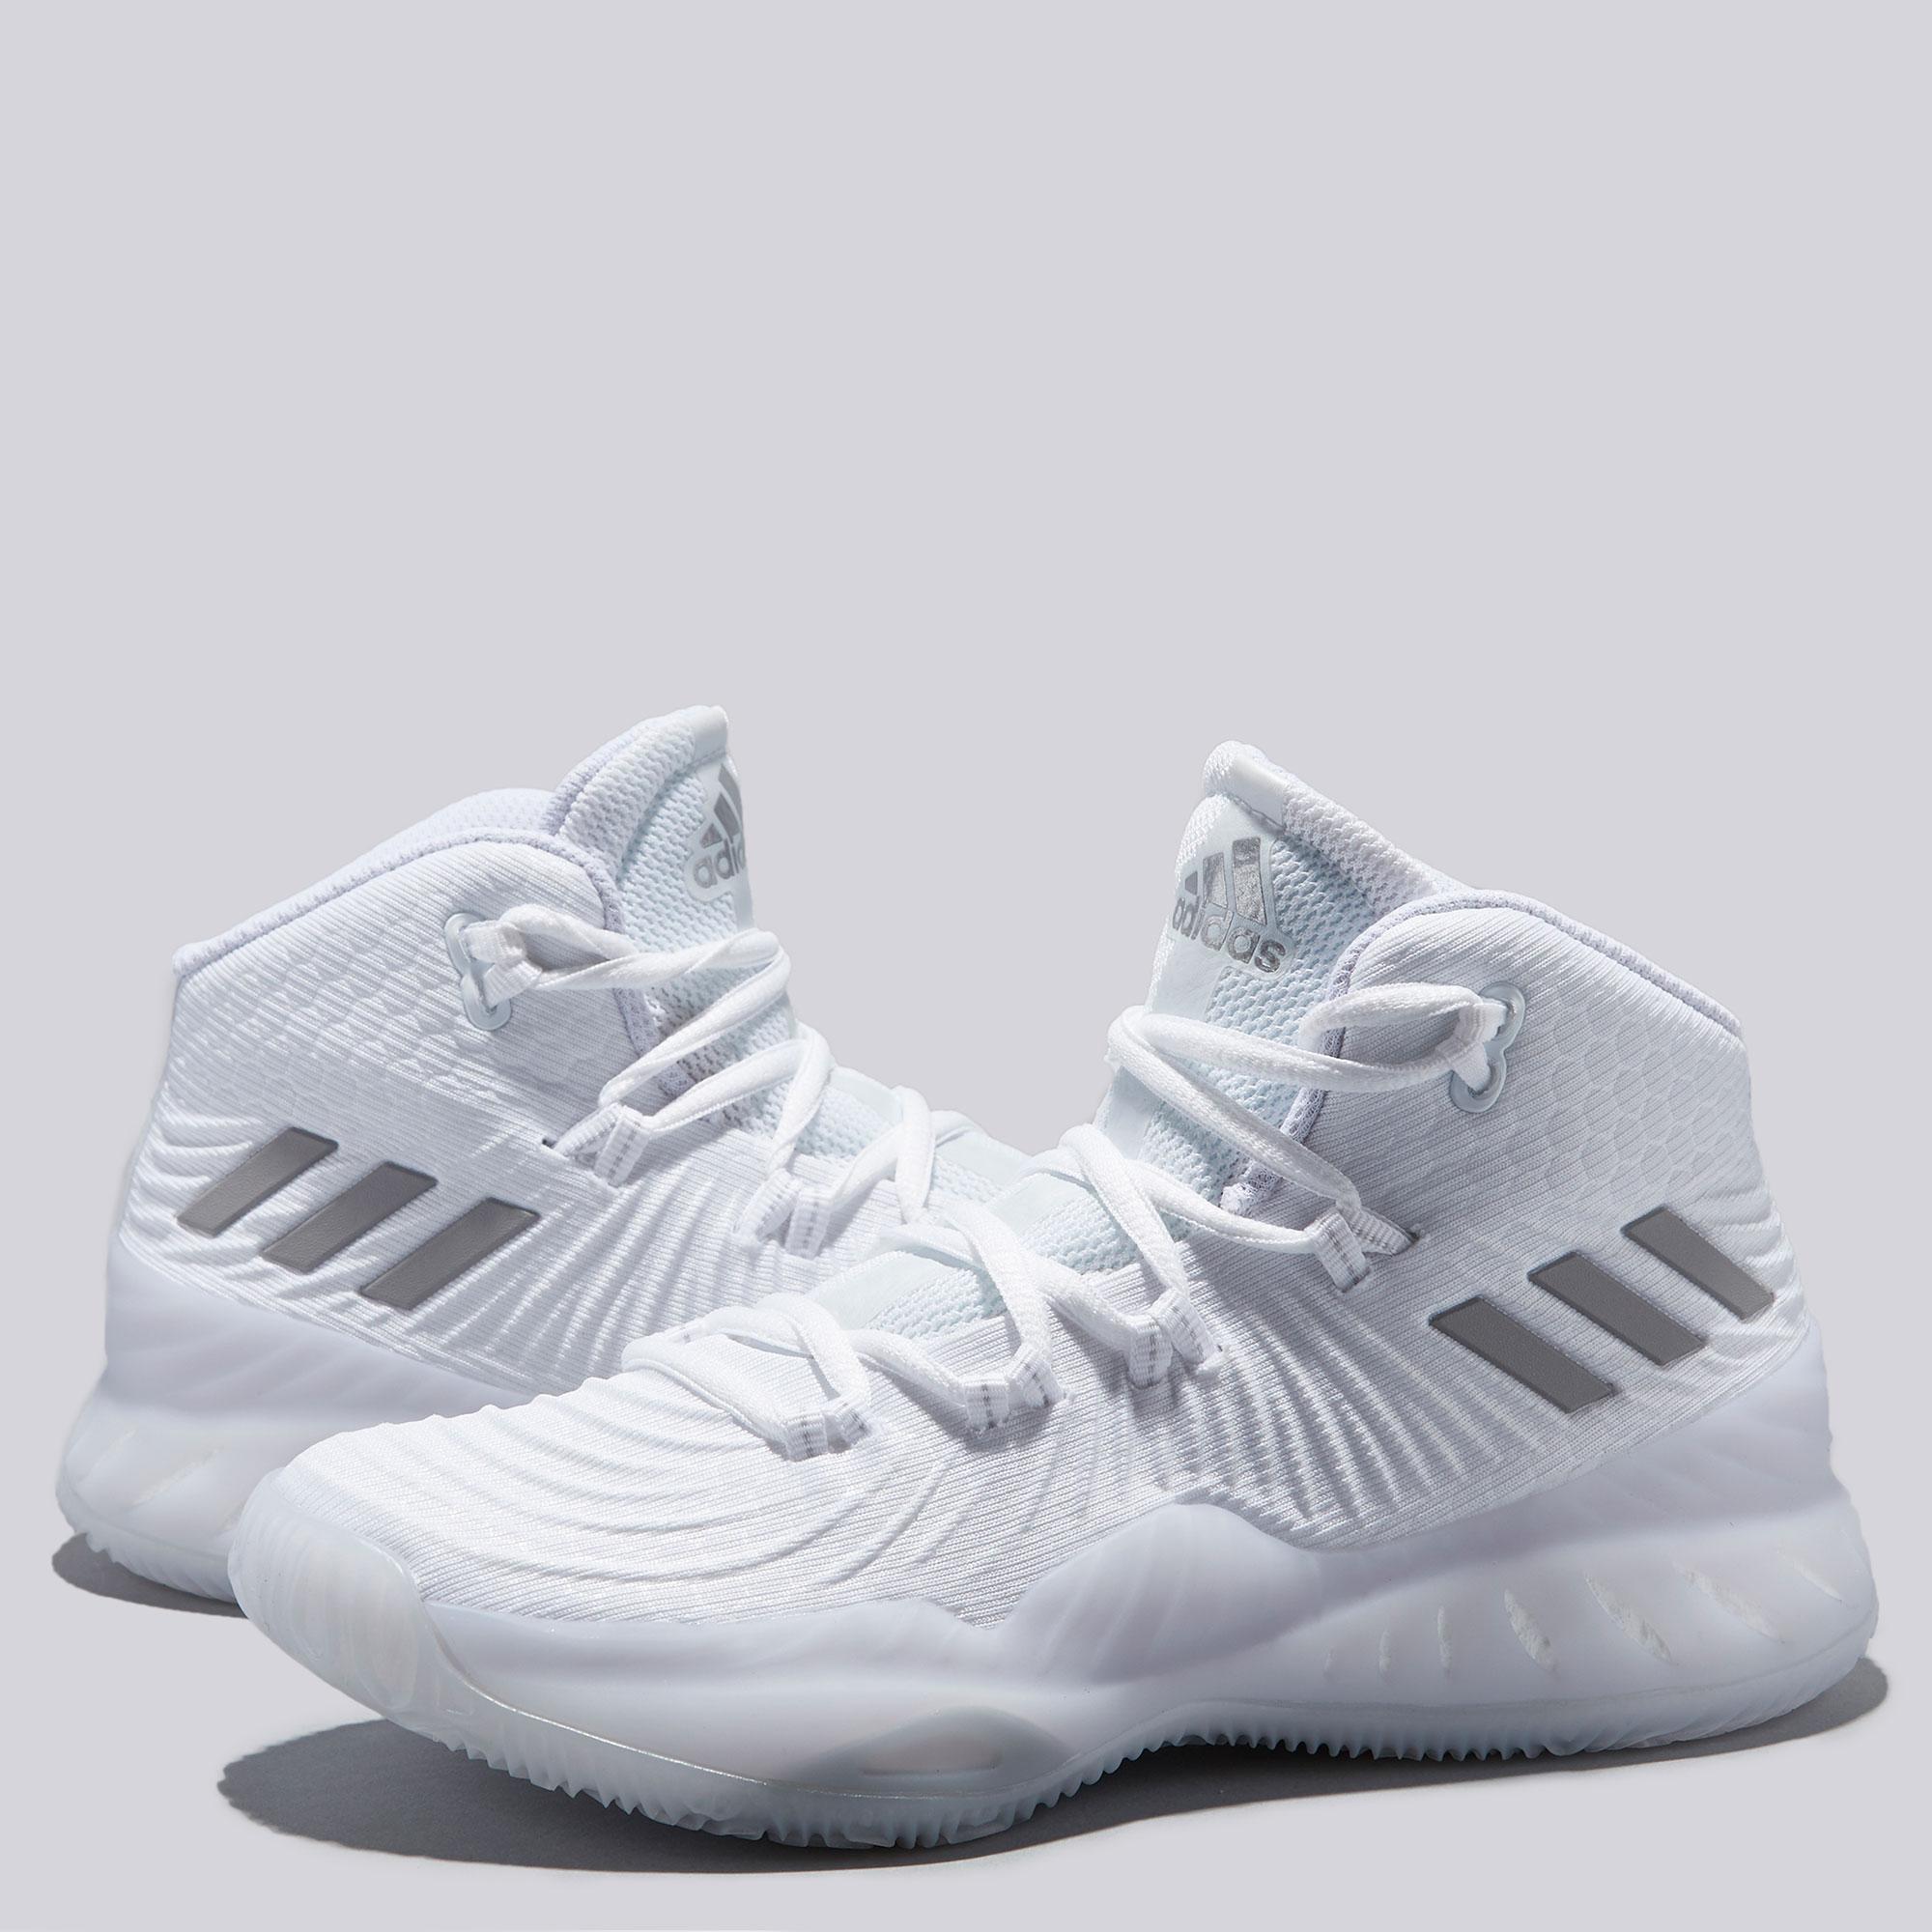 "Image of ""adidas Crazy Explosive 2017 Basketball Shoe - Core White - Youth"""